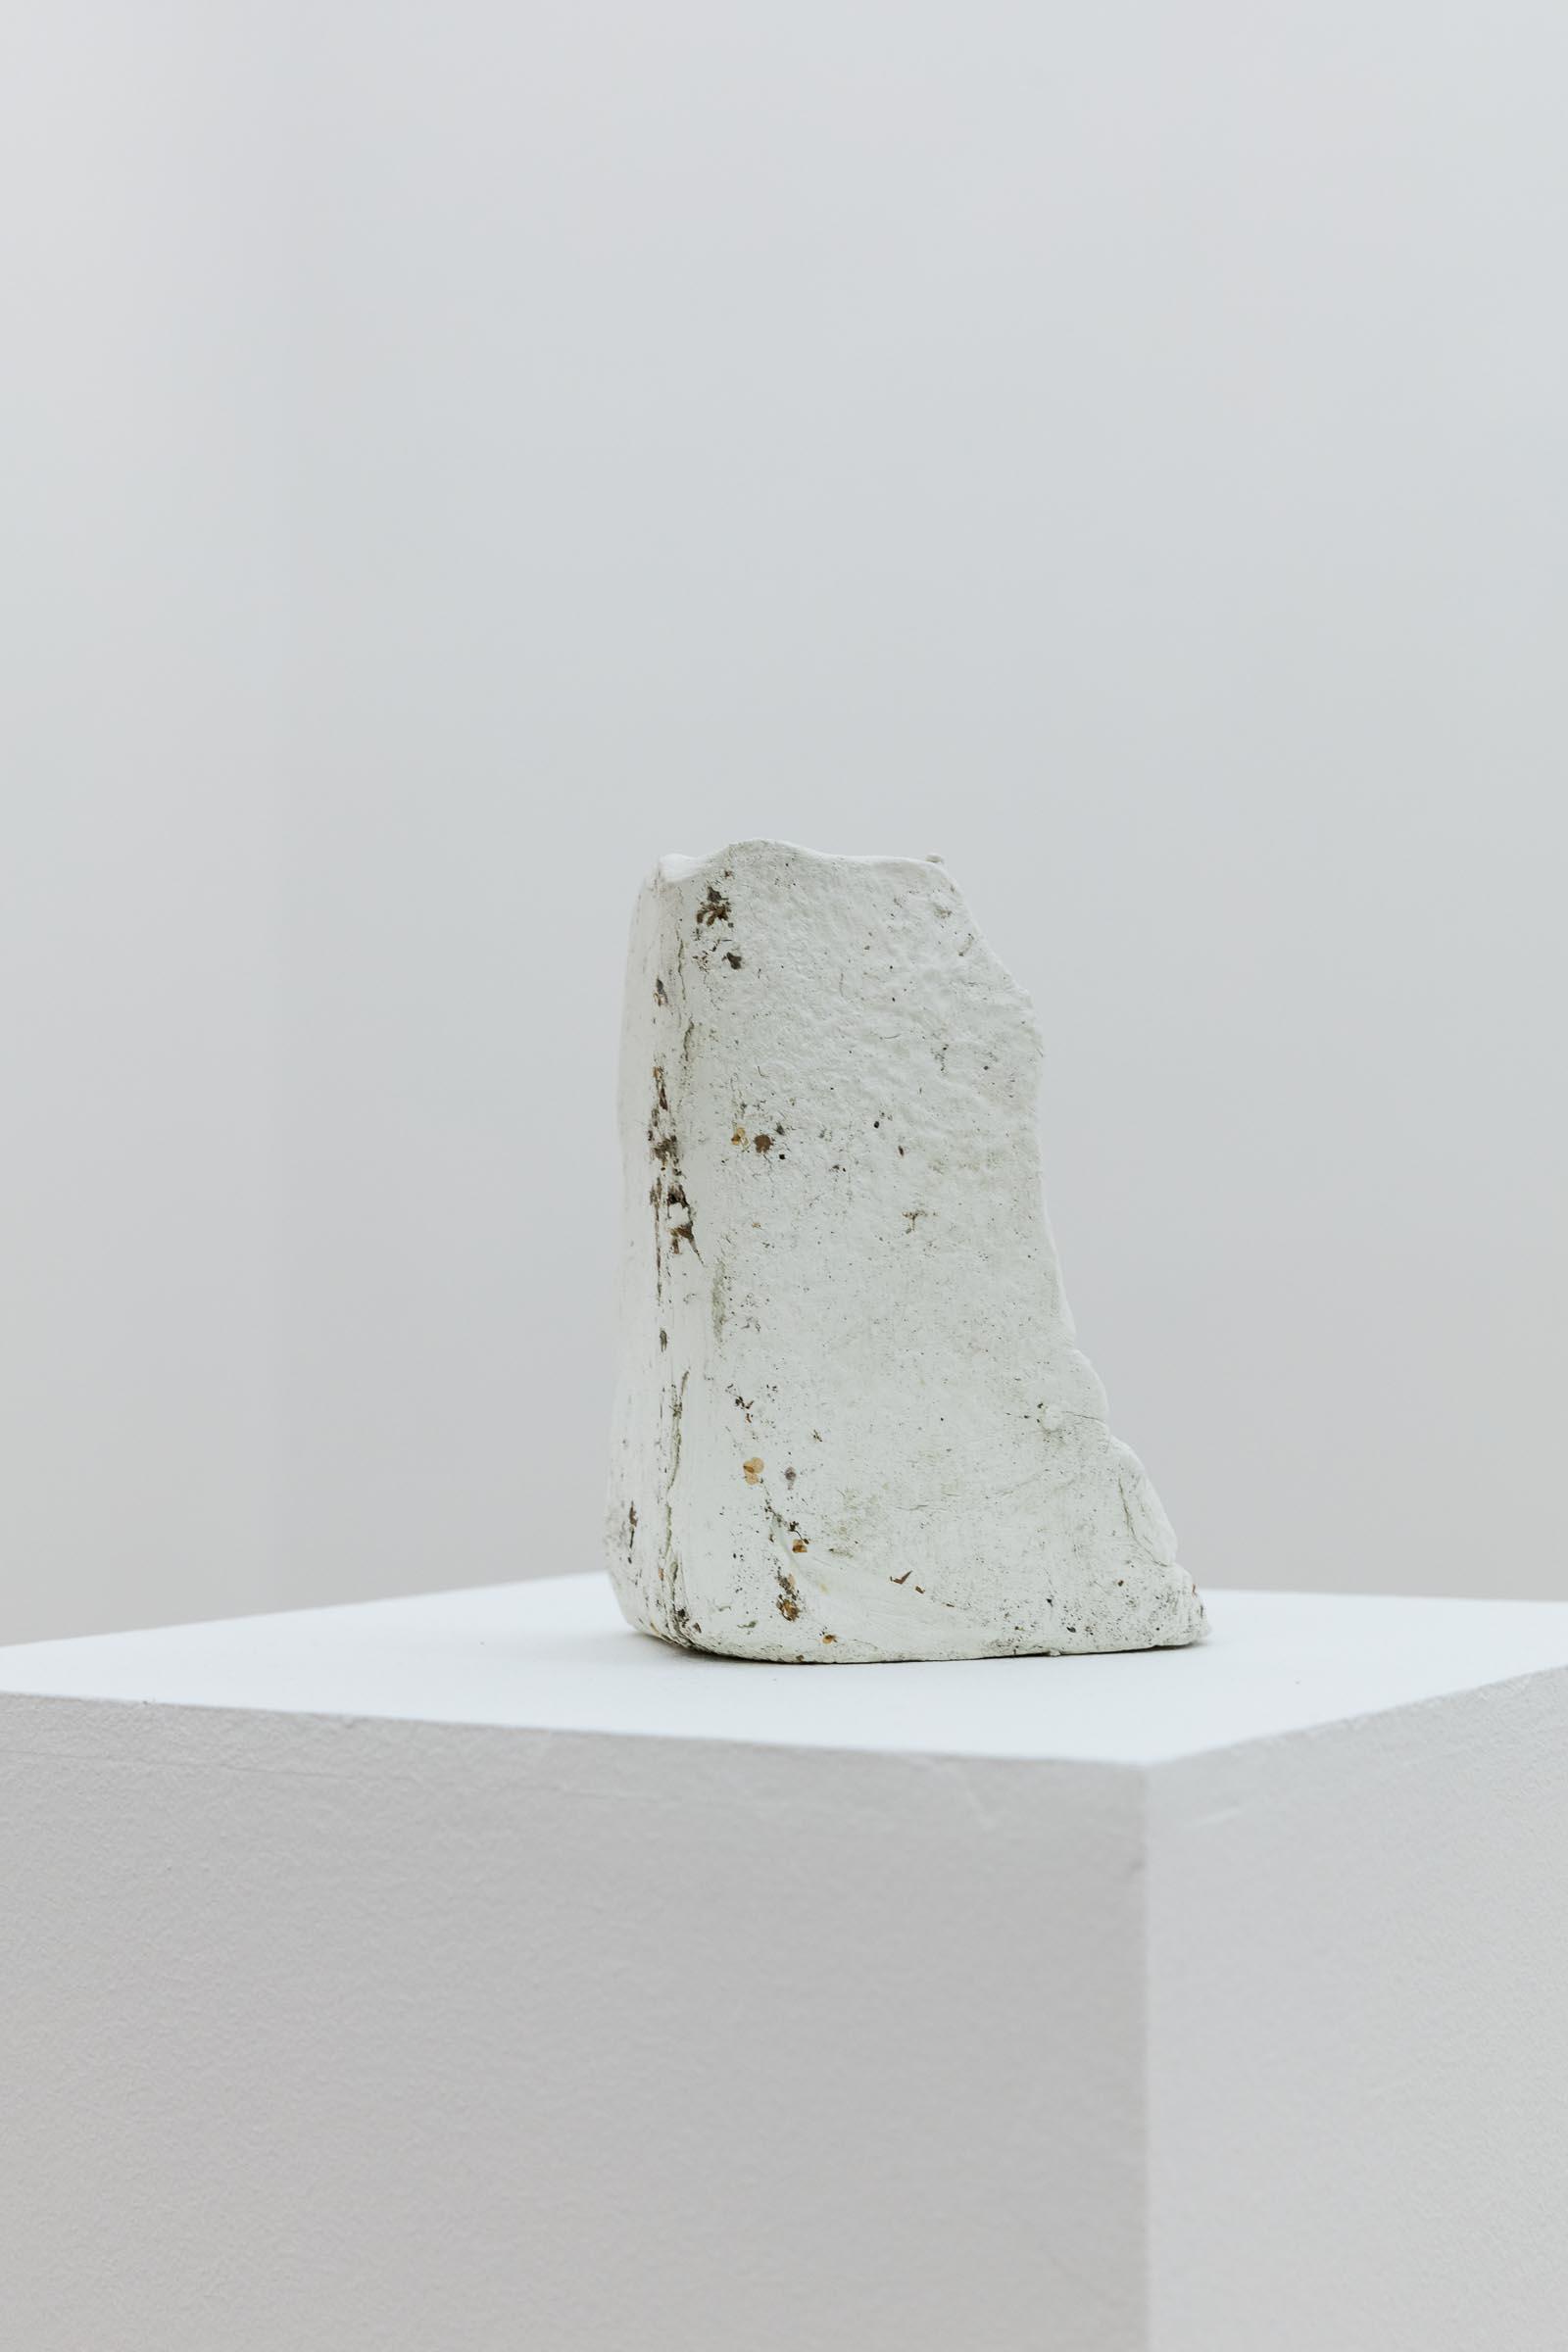 Detail: Thomas Geiger, Corners for Relief, 2019, Sculpting Clay, Filth, Plinth, Set of 5, Sculpture: 16 x 12 x 11 cm, Plinth: 105 x 27 x 27 cm